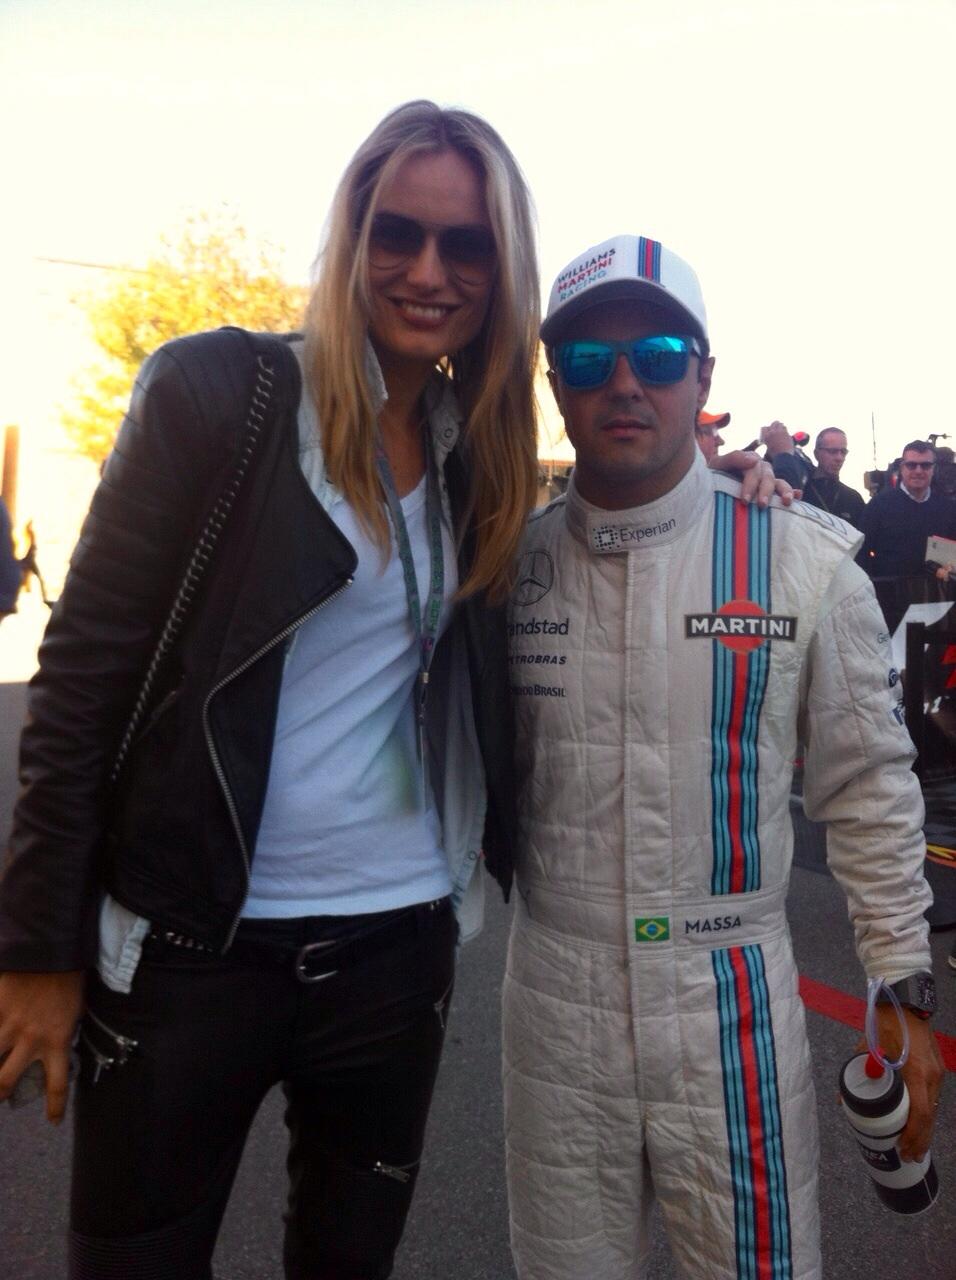 Congrats Felipe Massa on his amazing race ;-)